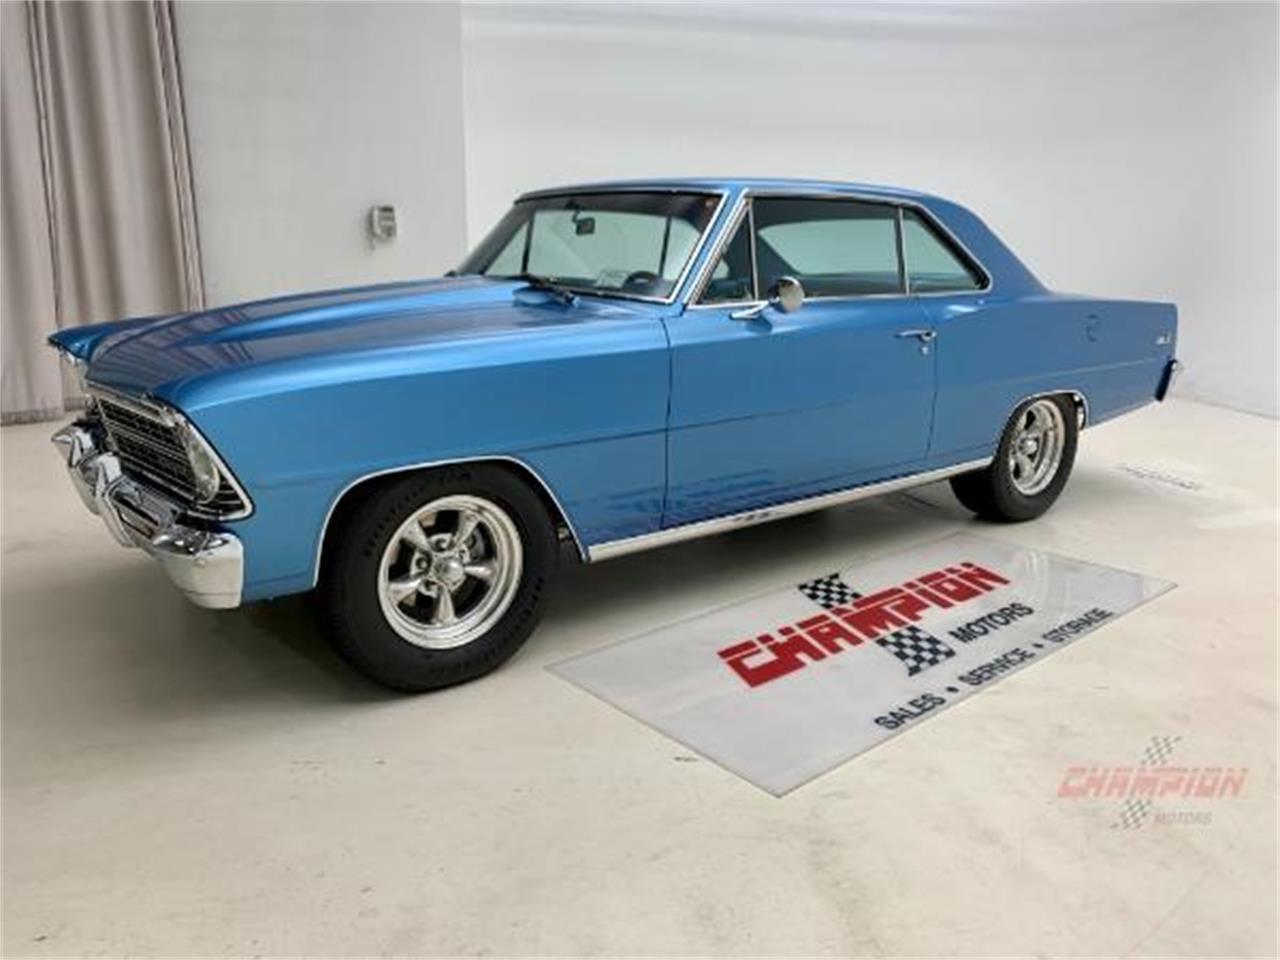 1967 Chevrolet Nova (CC-1423744) for sale in Syosset, New York